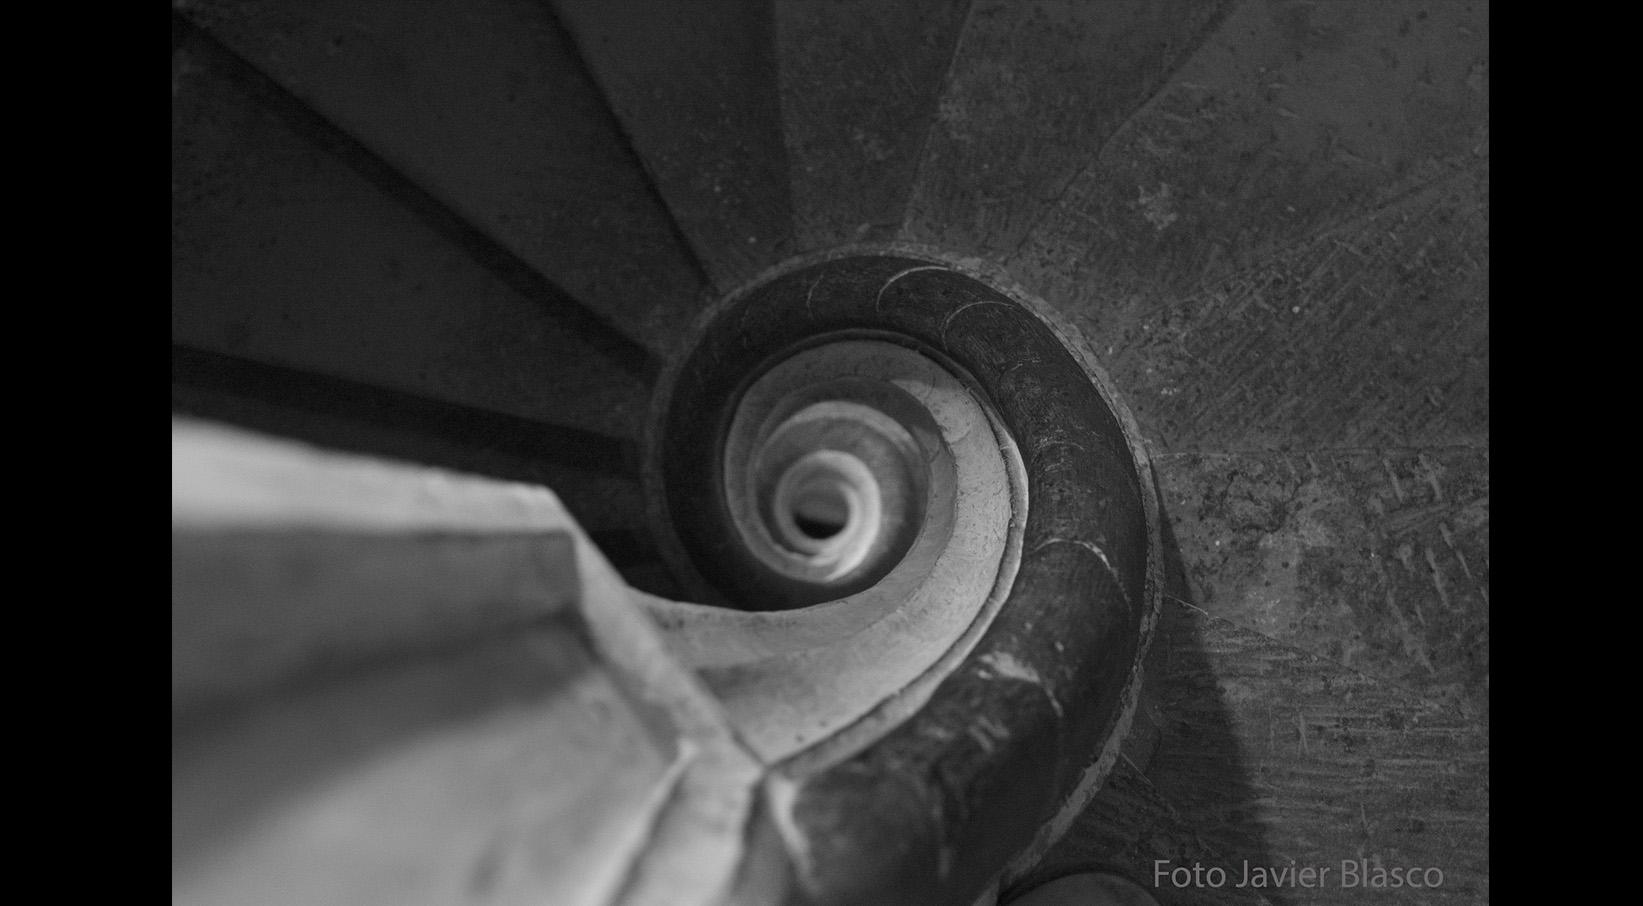 Escaleras de la Catedral de Huesca